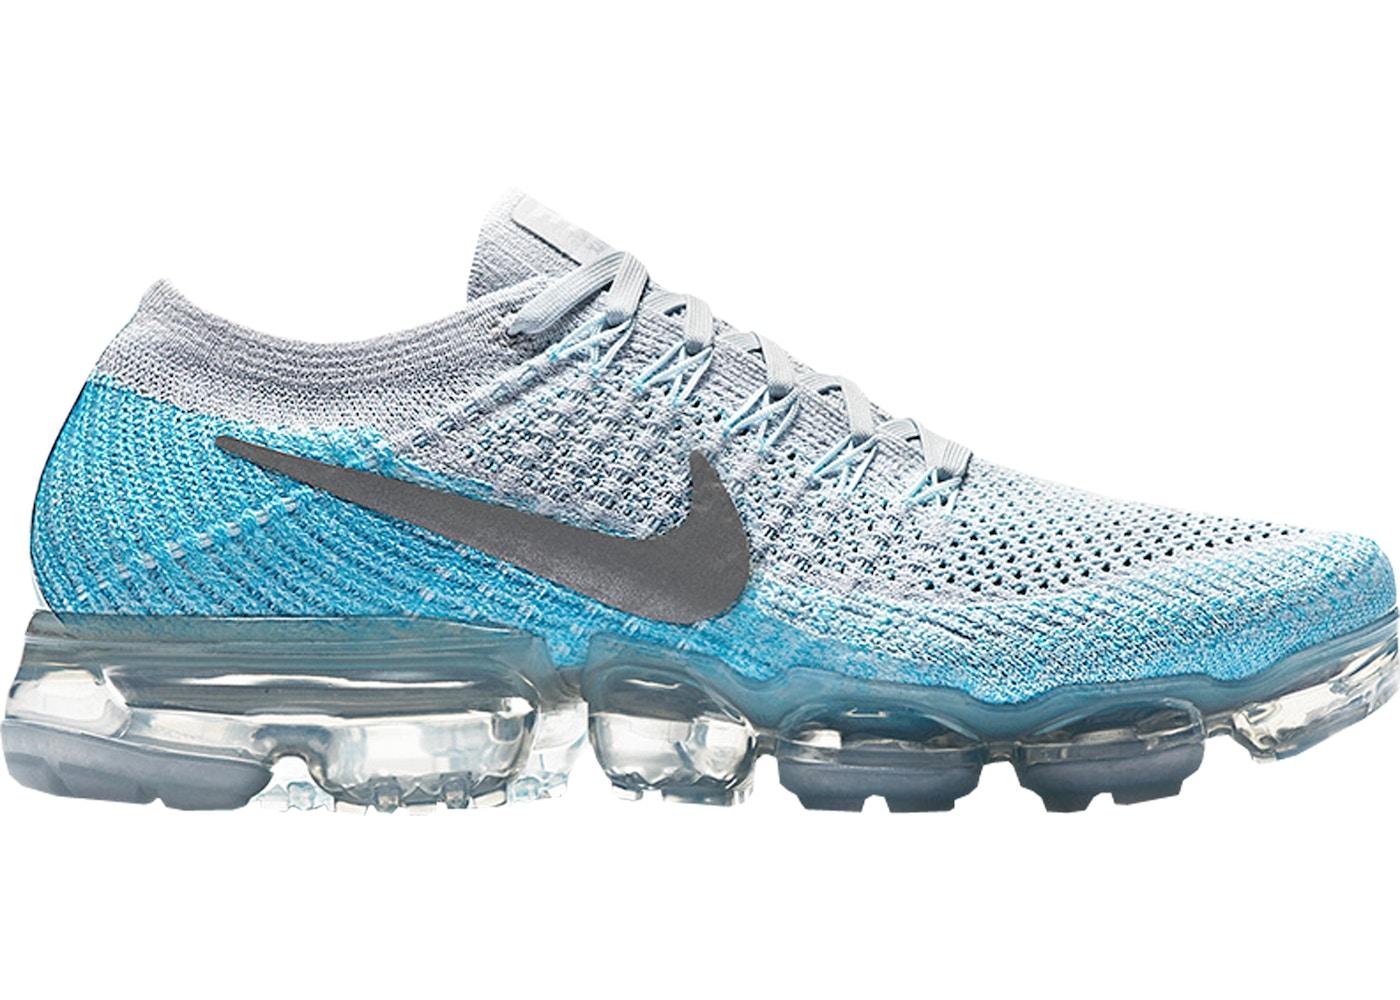 entregar SIDA Oficial  Nike Air VaporMax Ice Flash (W) - 849557-014